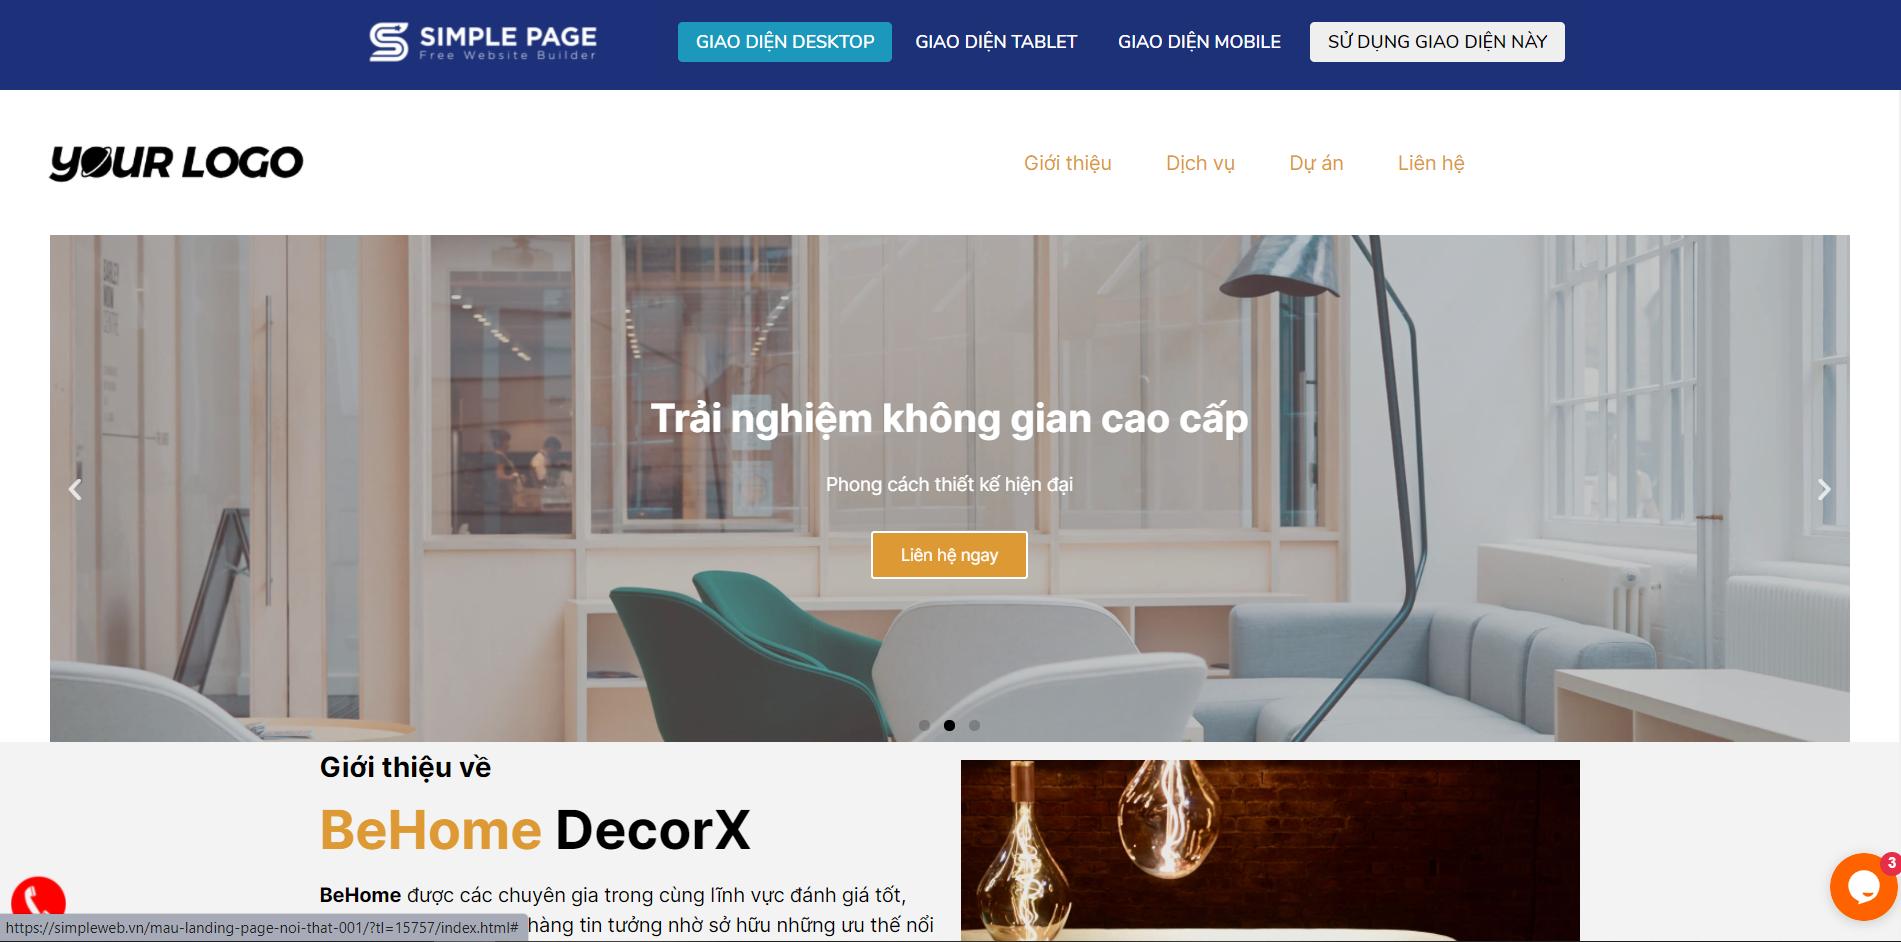 mẫu landing page thiết kế nội thất